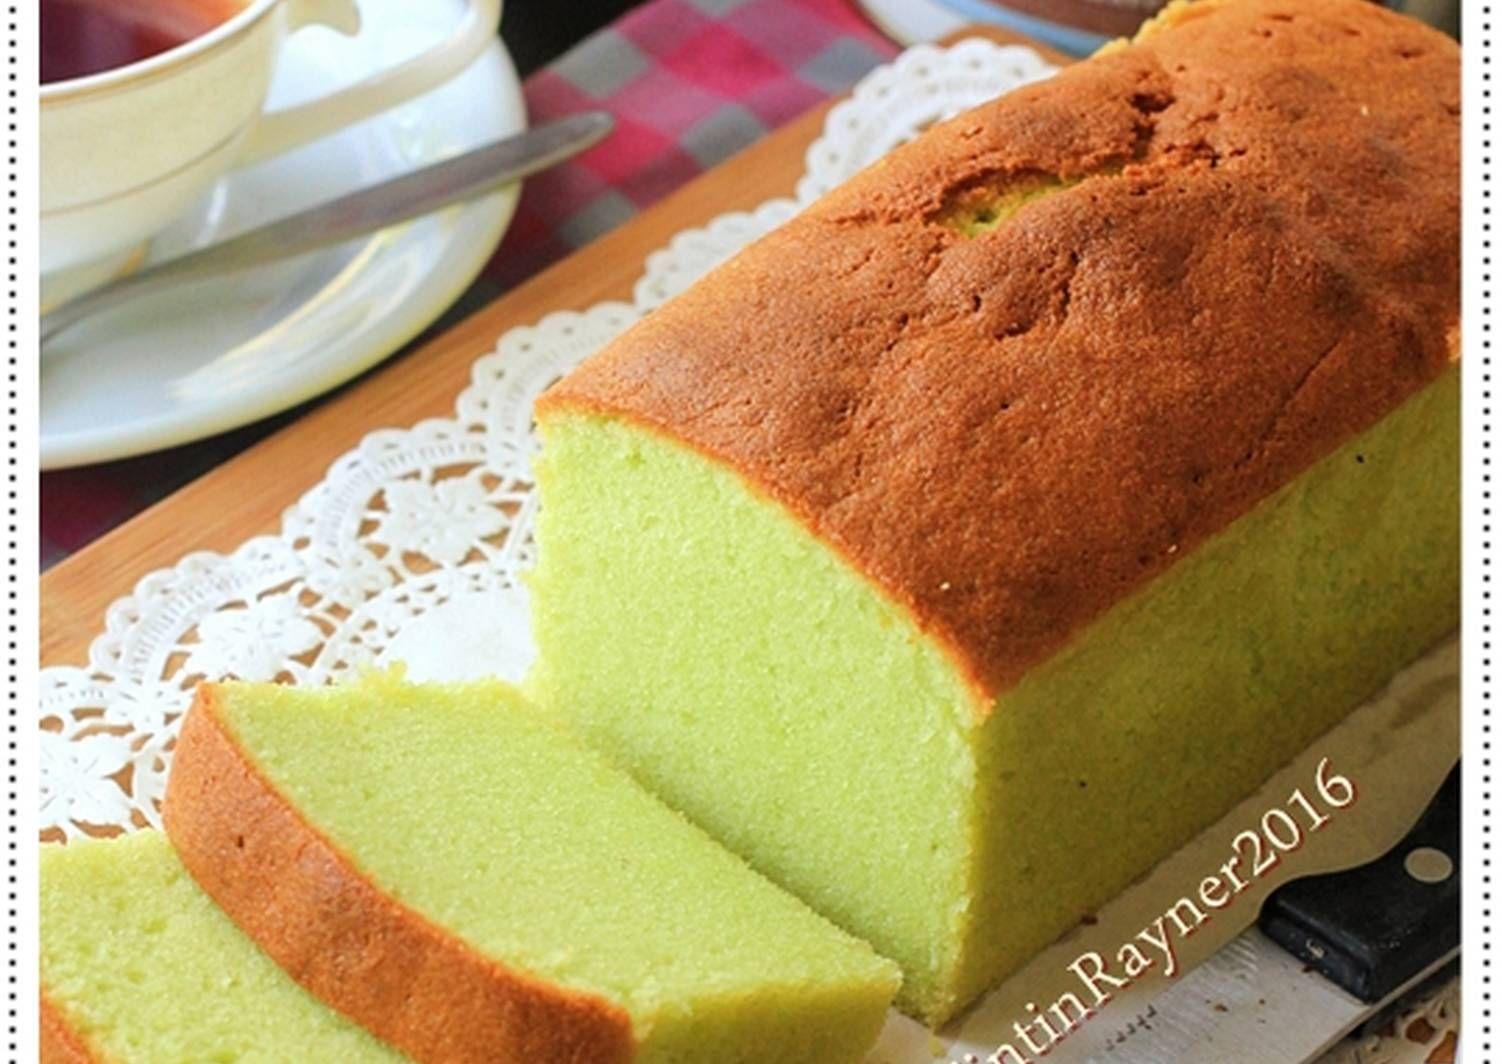 Resep Condensed Milk Pandan Pound Cake 5 Bahan Yummy Oleh Tintin Rayner Resep Tea Cake Resep Kue Mangkok Resep